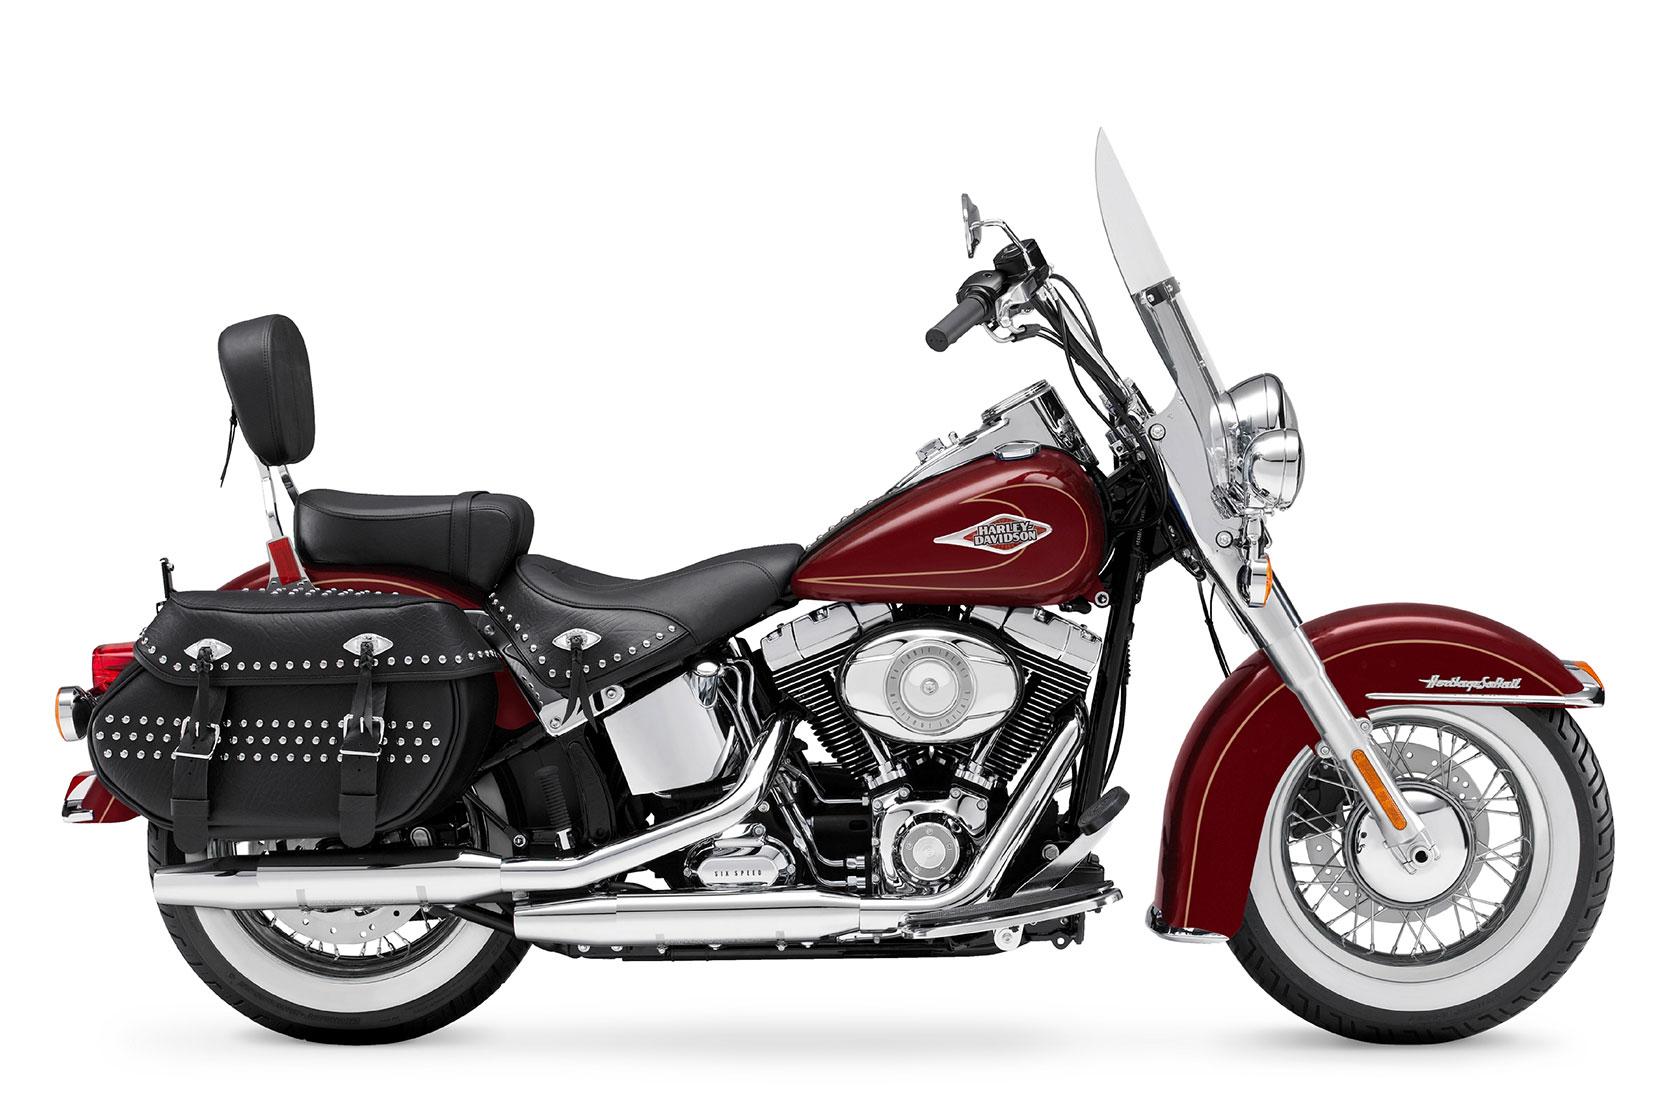 Harley Davidson Heritage Softail Classic Specs 2009